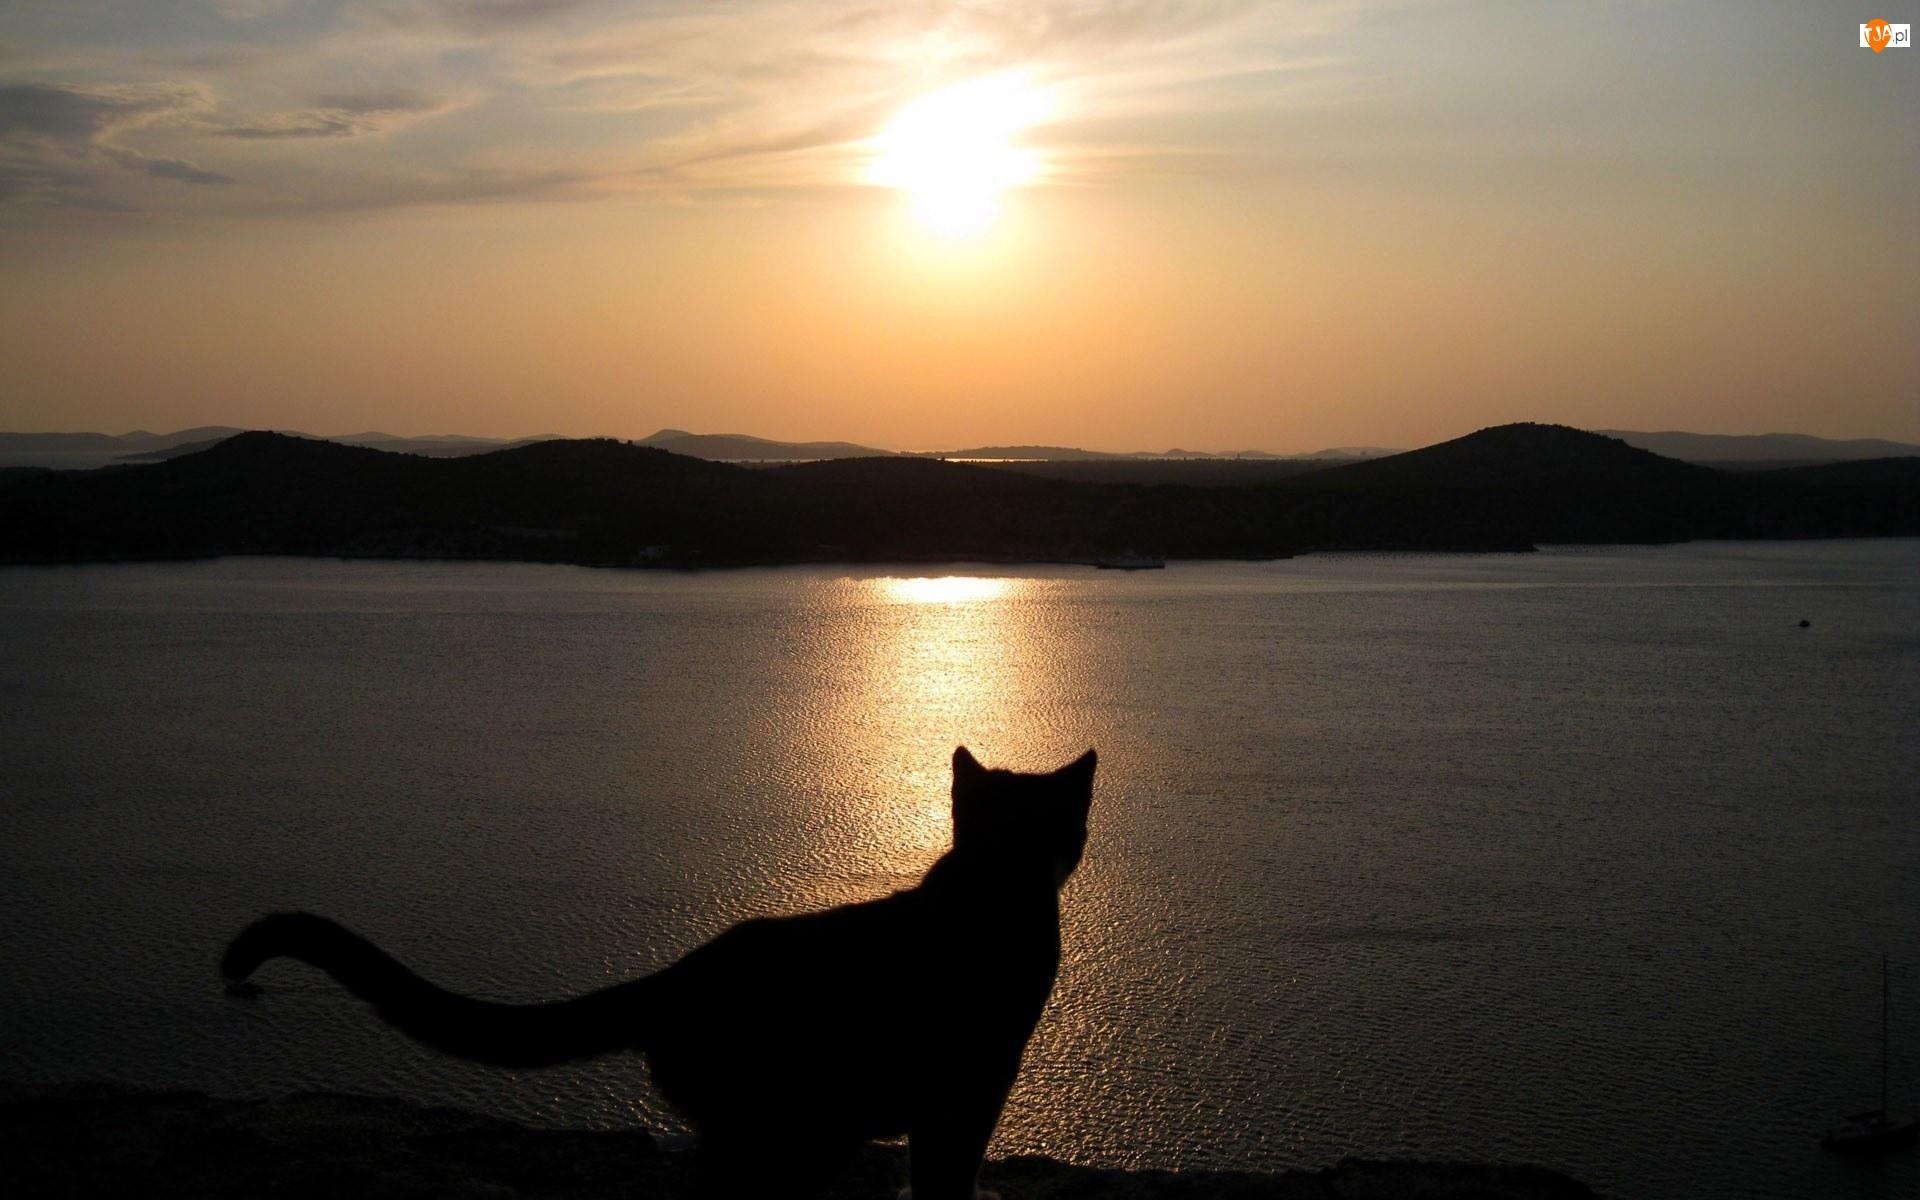 Góry, Kot, Jezioro, Zachód słońca